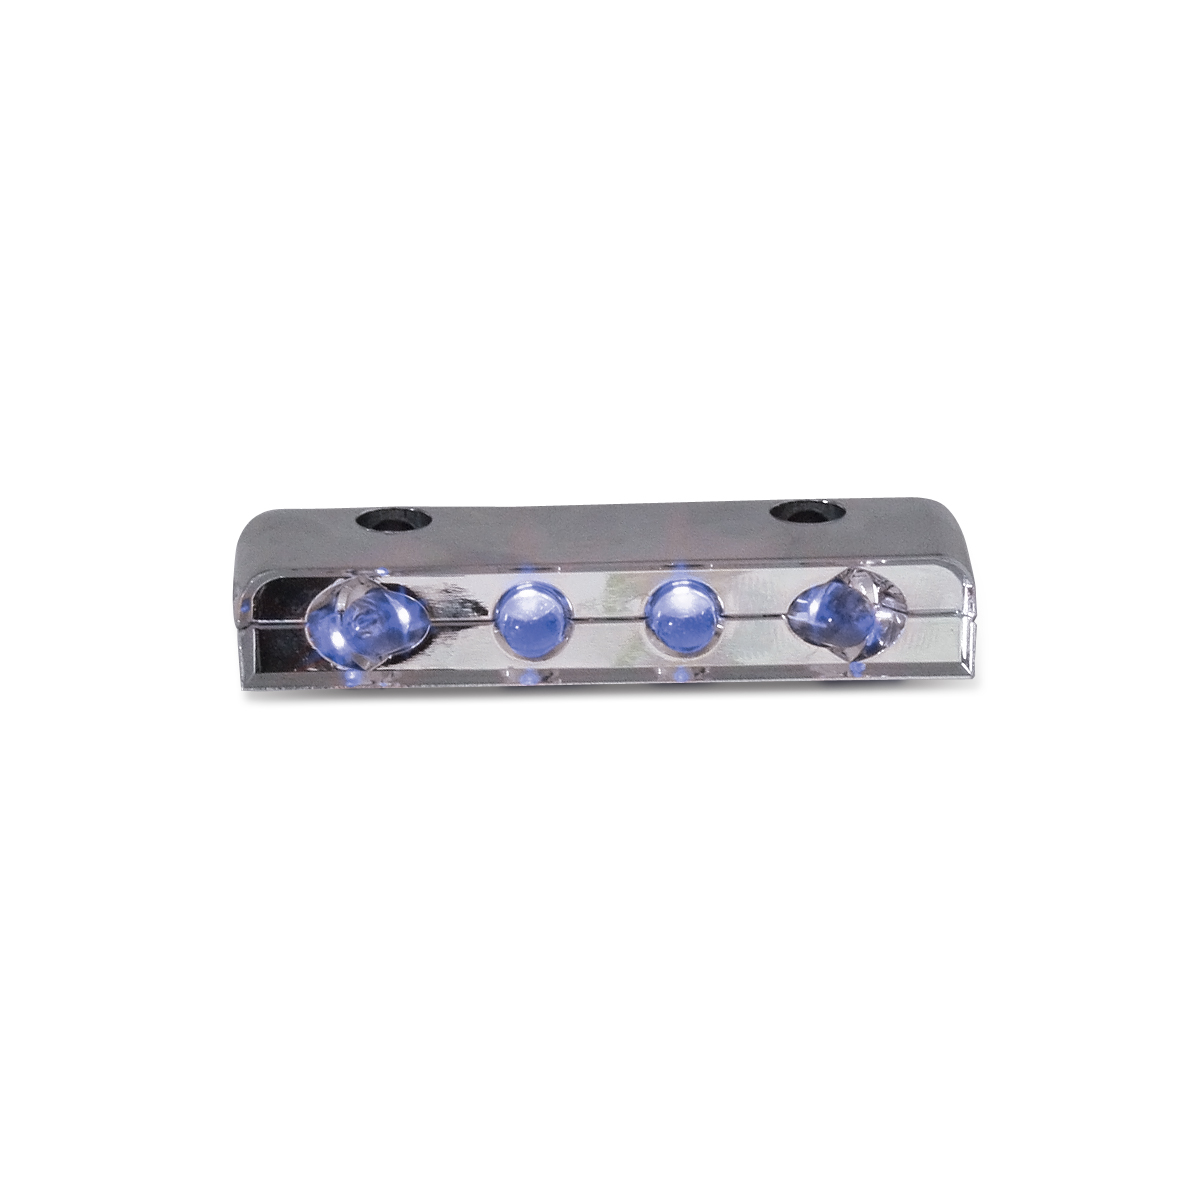 77101 Blue 4 LED Step Light